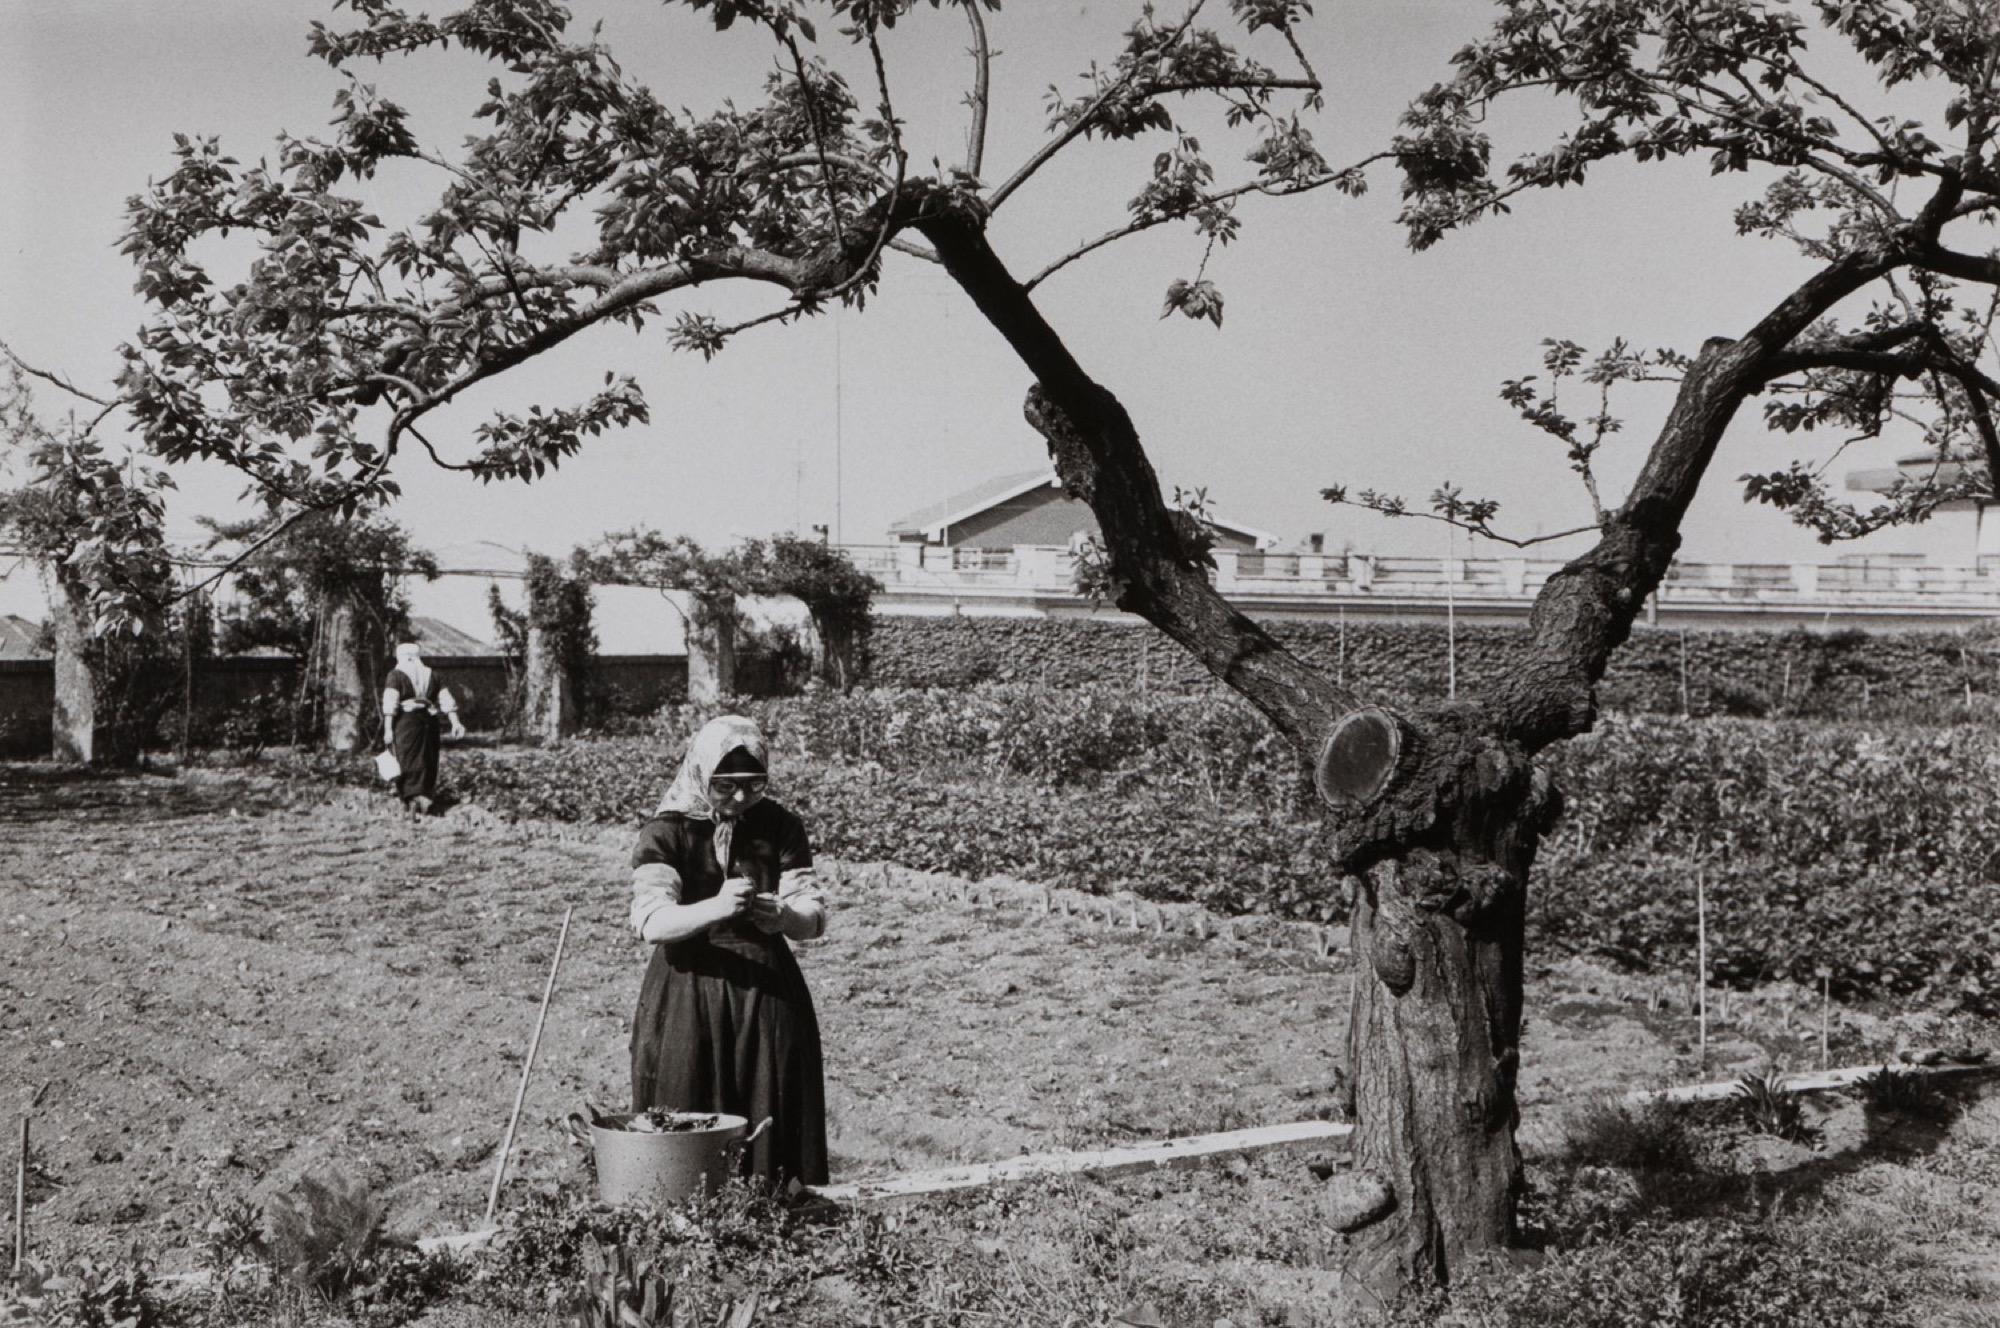 Edouard Boubat (1923-1999) - Untitled (Countrywoman), years 1950 - Two gelatin [...] - Image 3 of 3